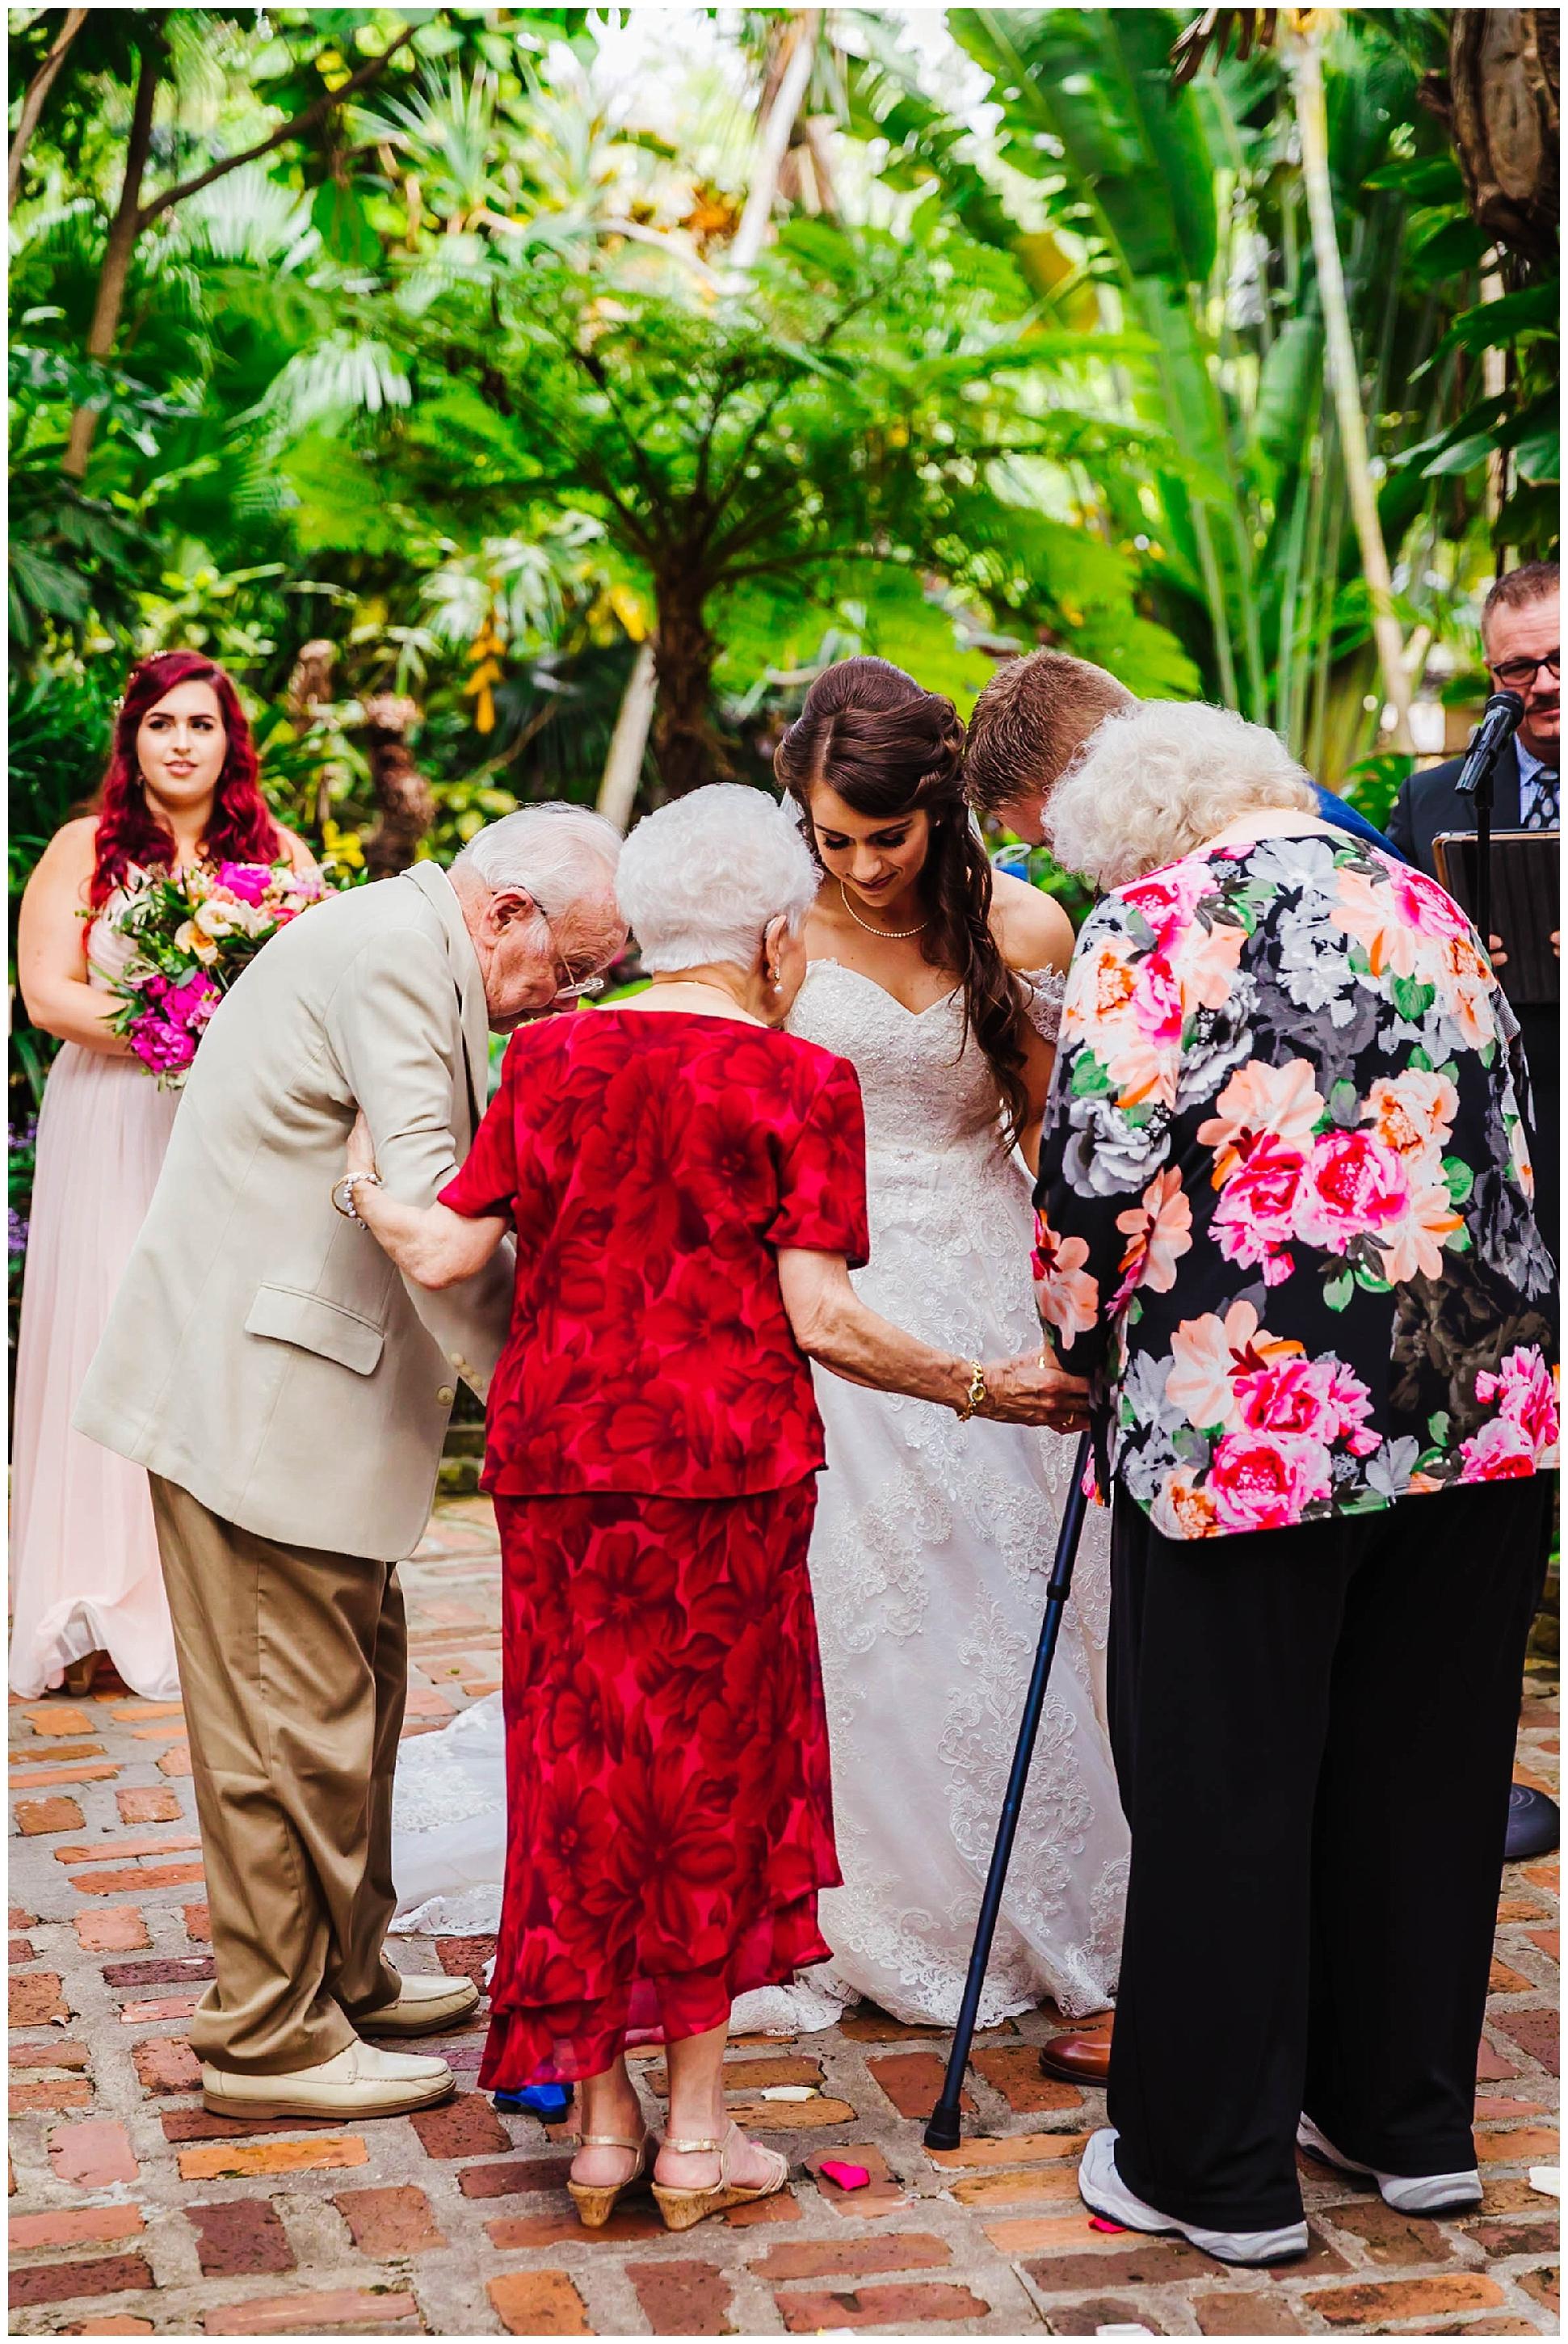 st-pete-wedding-photographer-sunken-gardens-crystal-ballroom-princess-dancer_0158.jpg